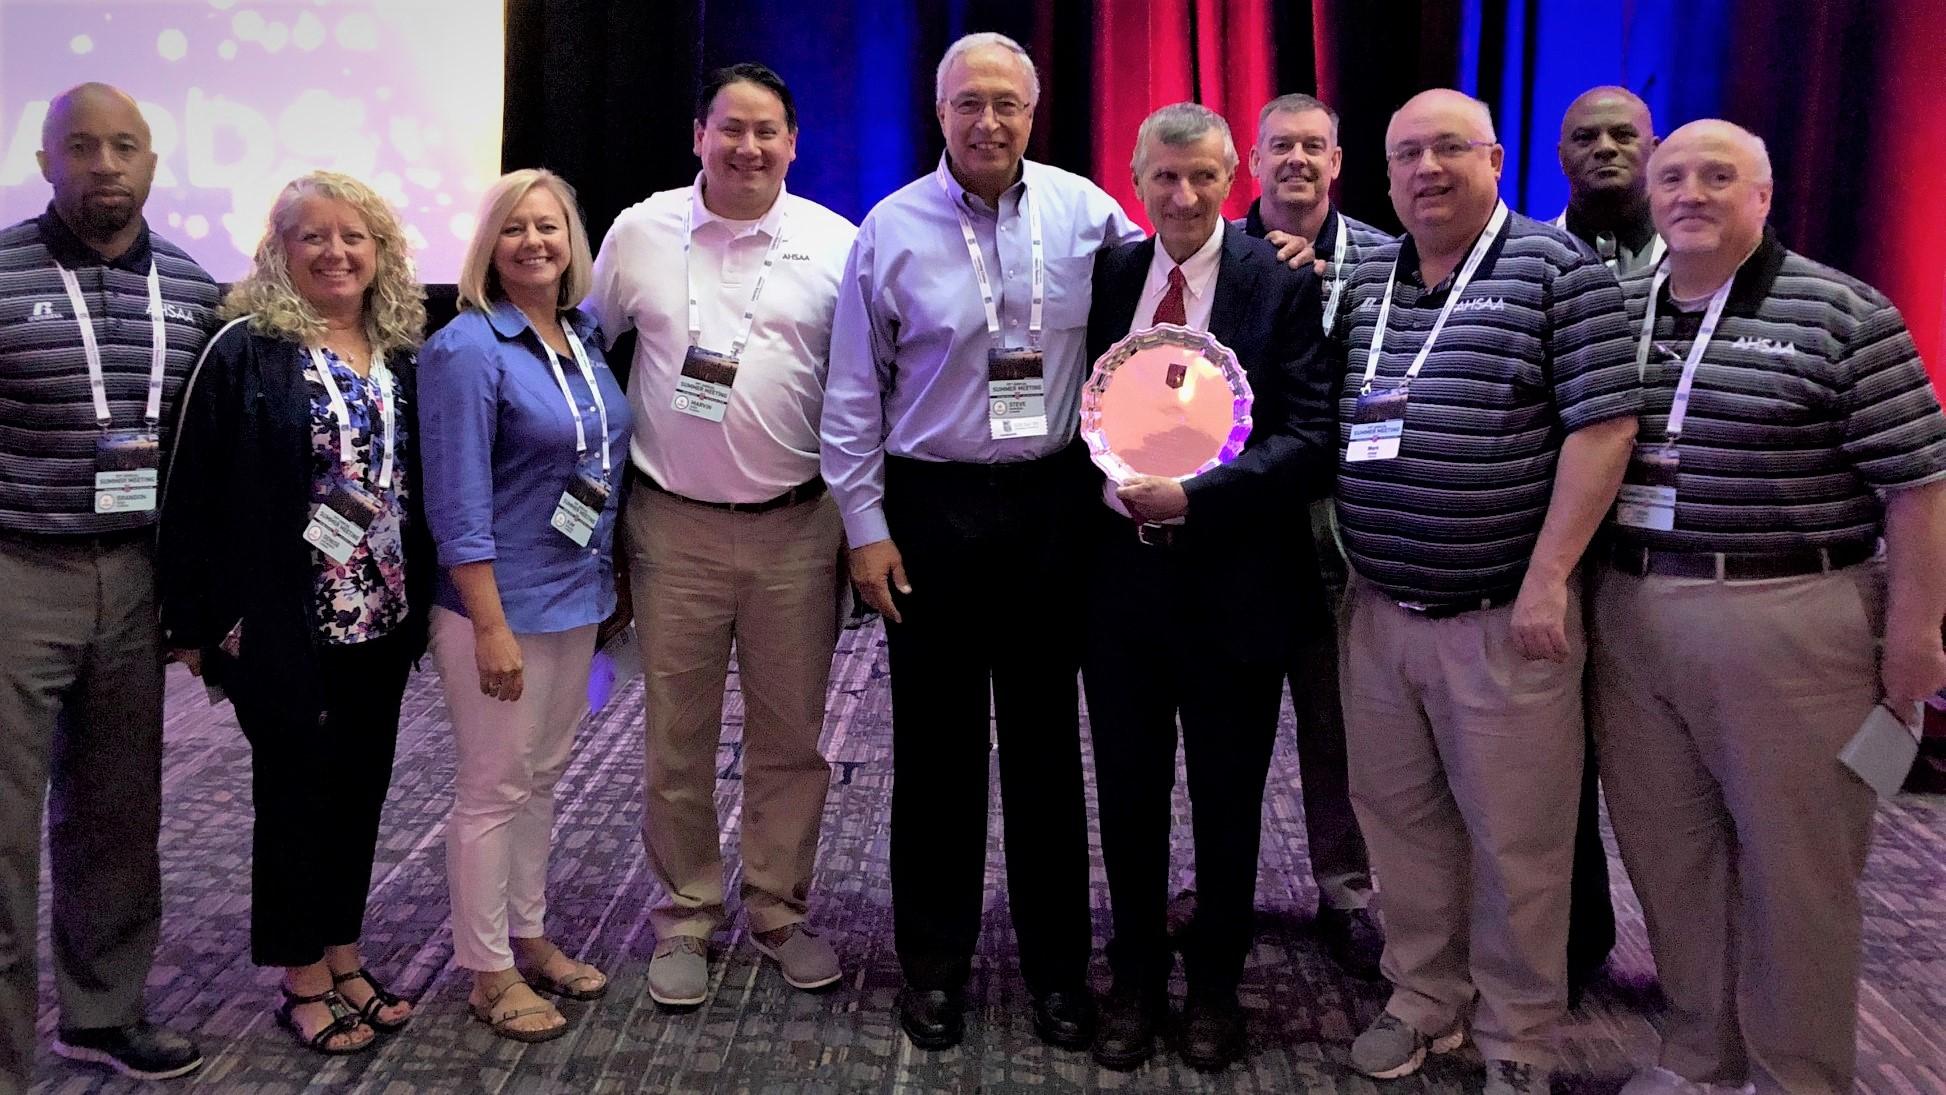 AHSAA Soccer Official Joe Manjone Receives NFHS Citation for Officiating